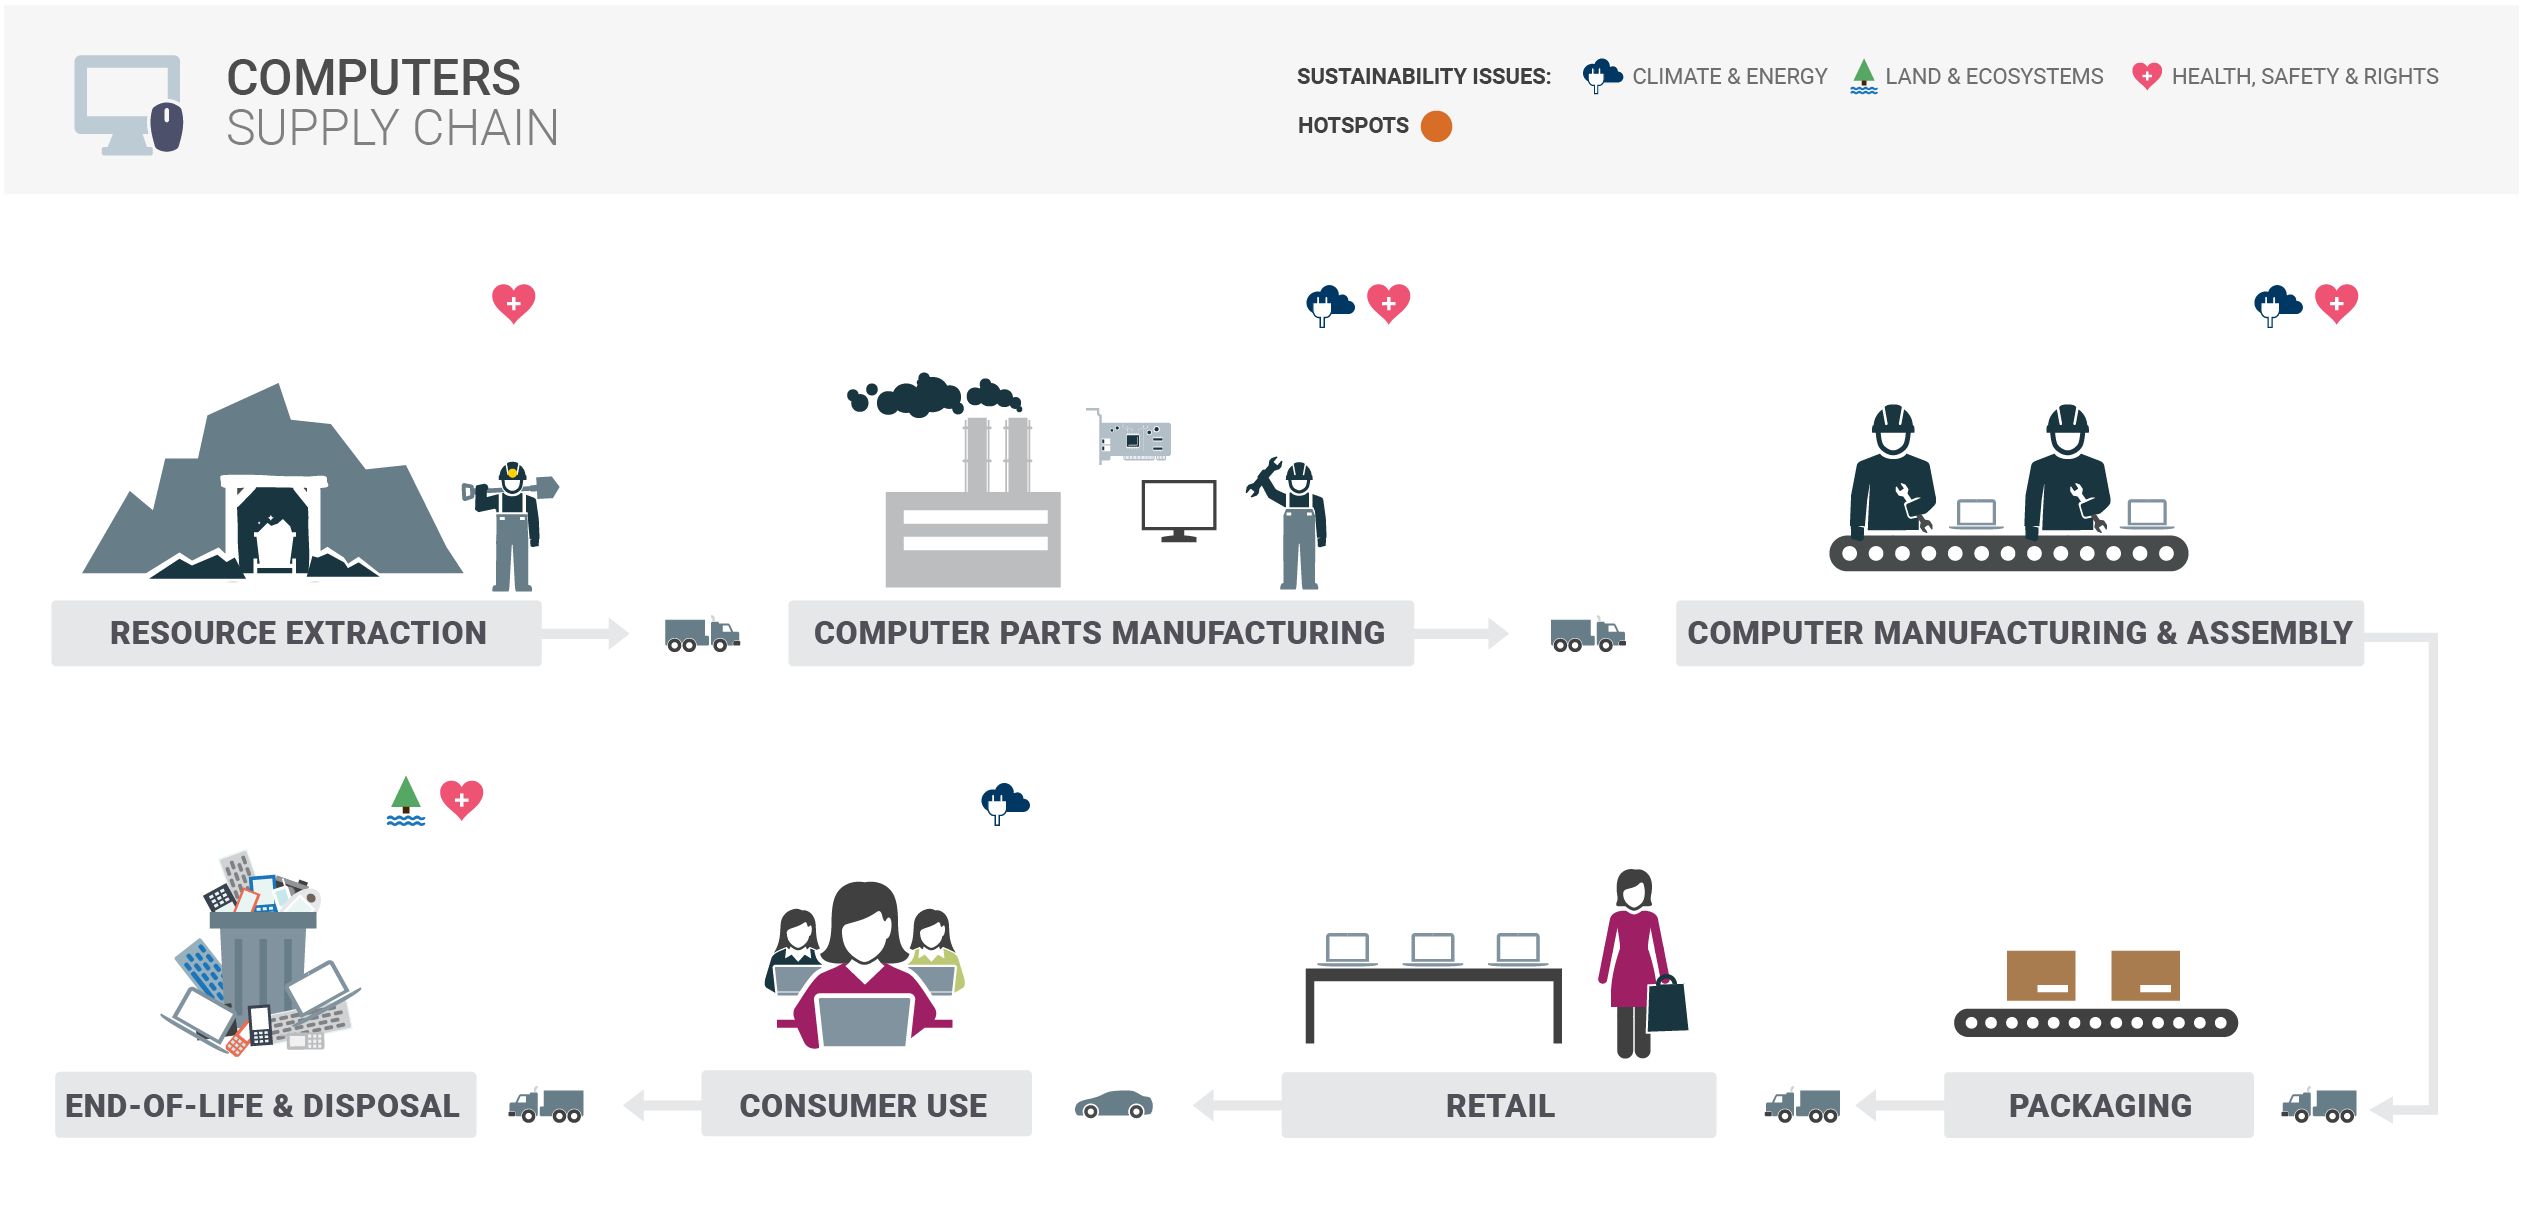 Computers Supply Chain